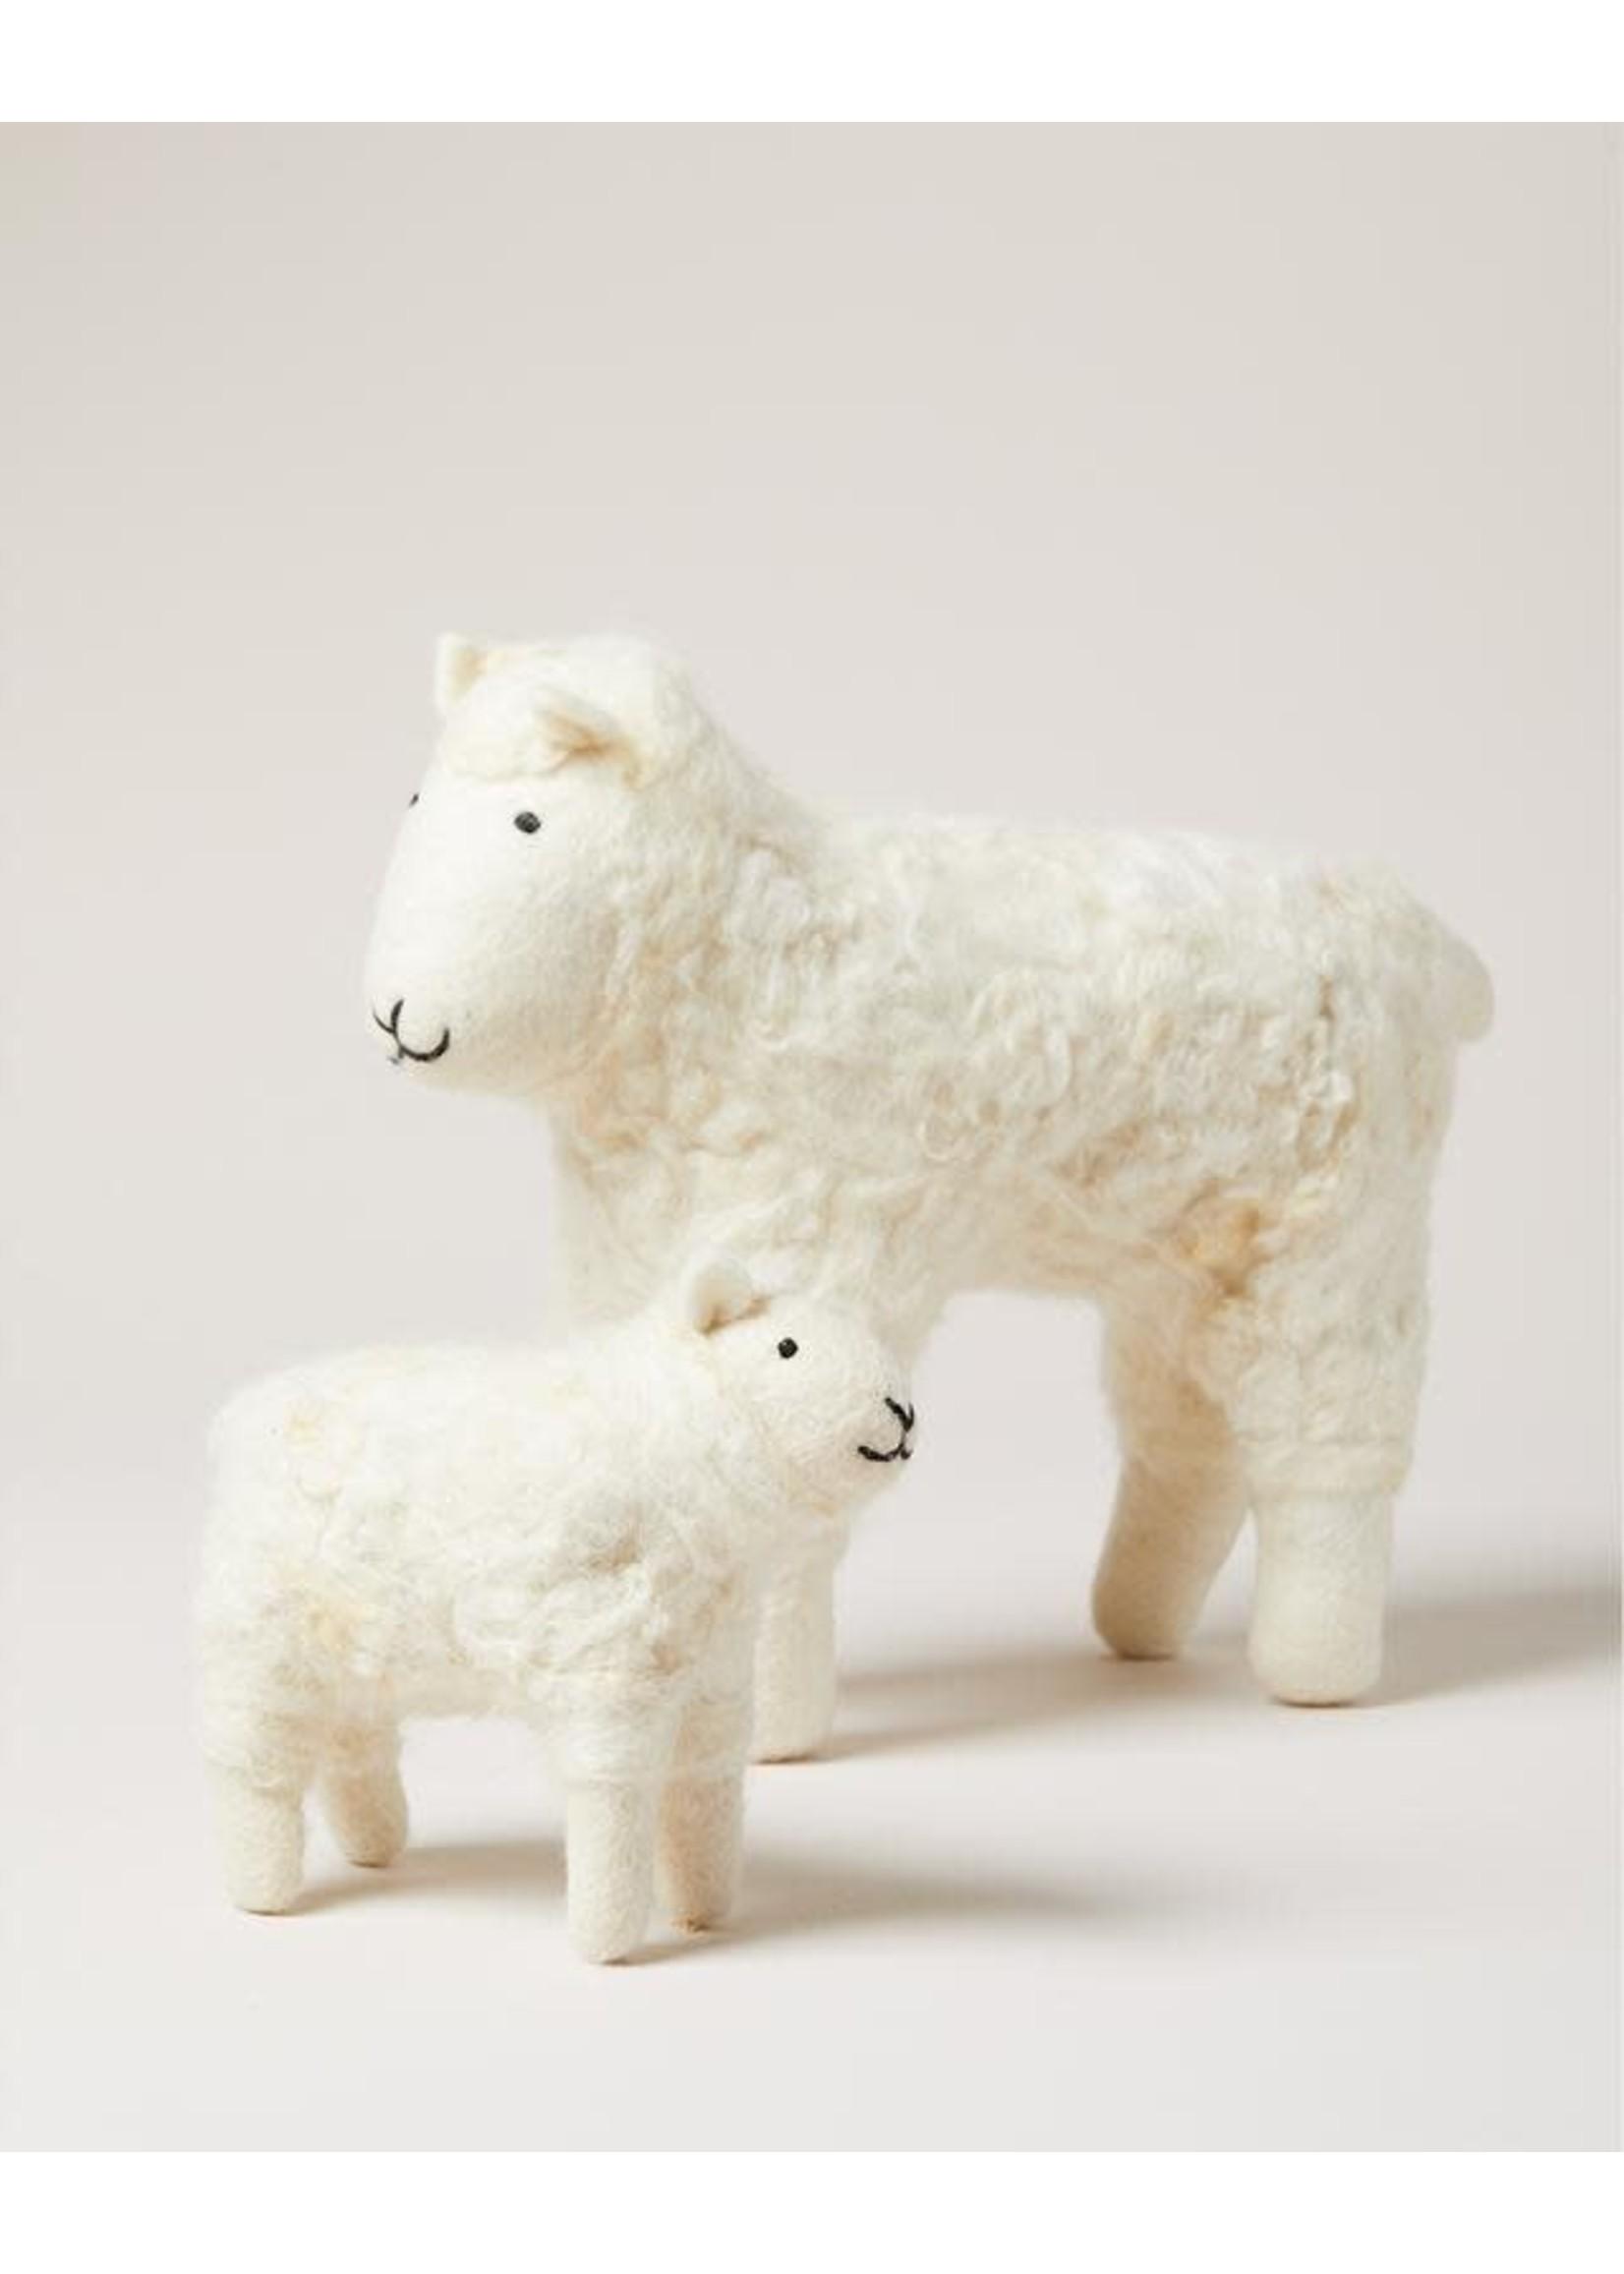 Farmhouse Pottery Sheep Stuffie - Small